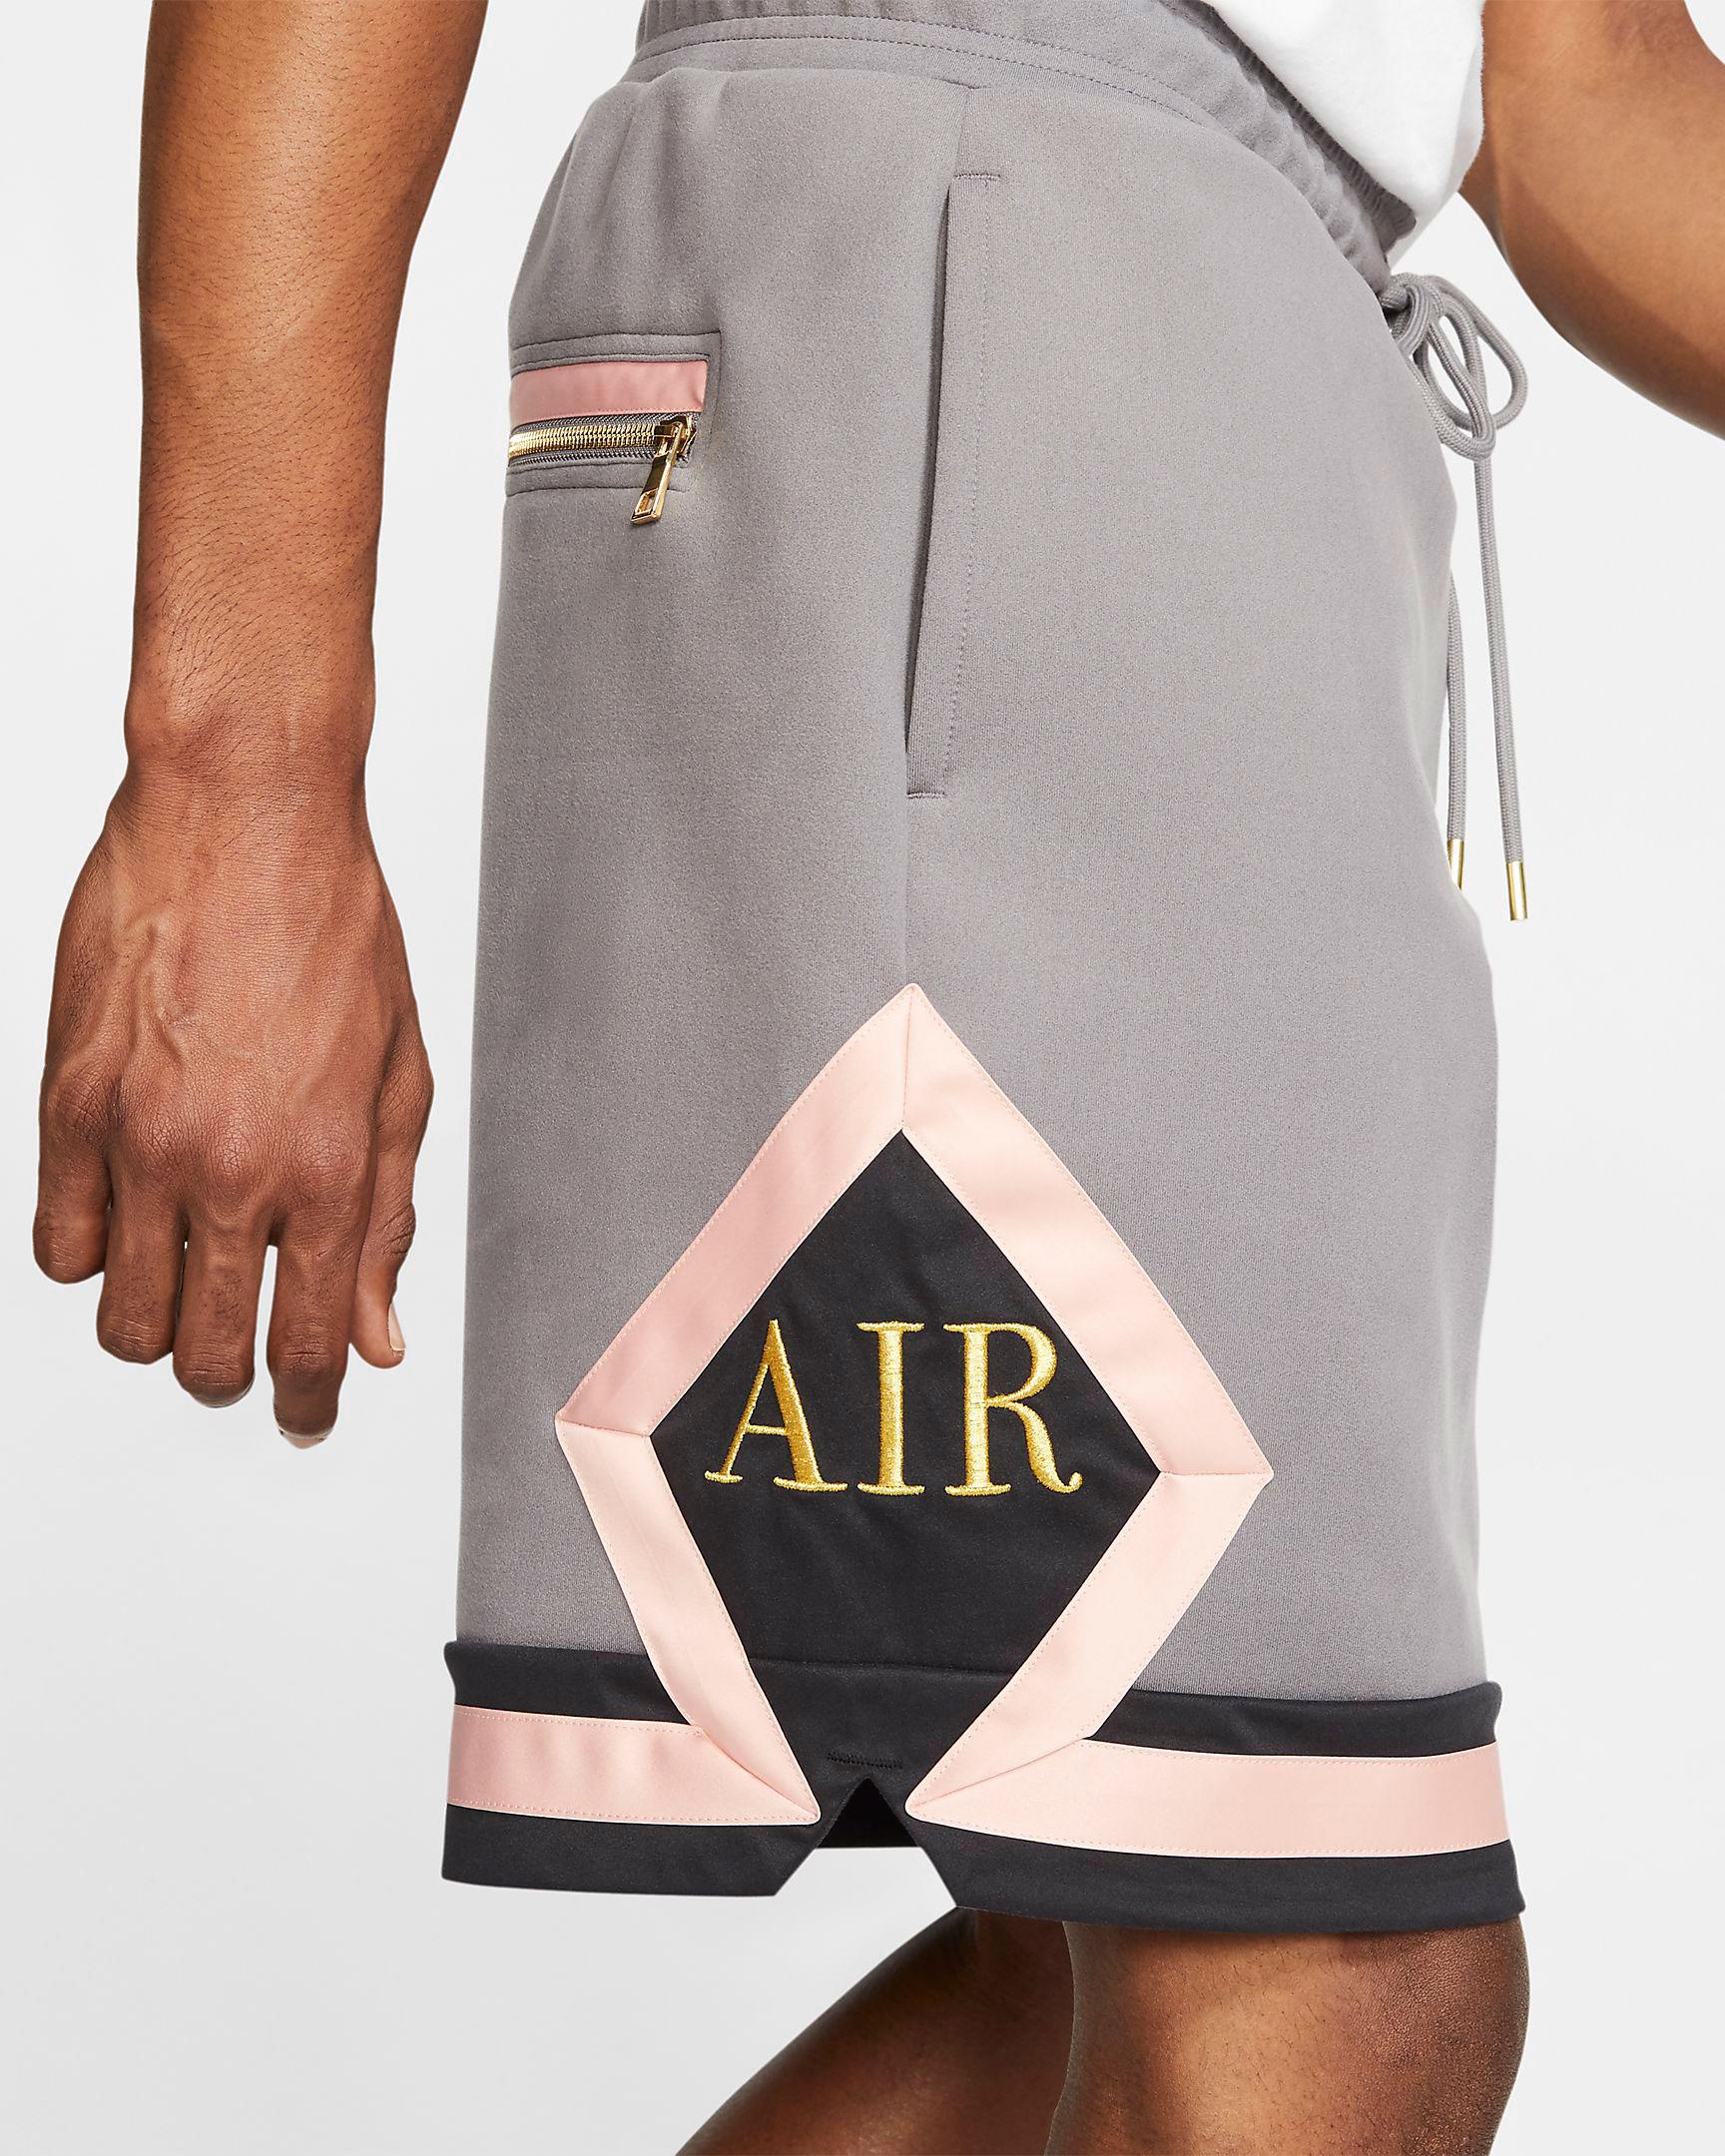 jordan-remastered-diamond-shorts-grey-pink-2